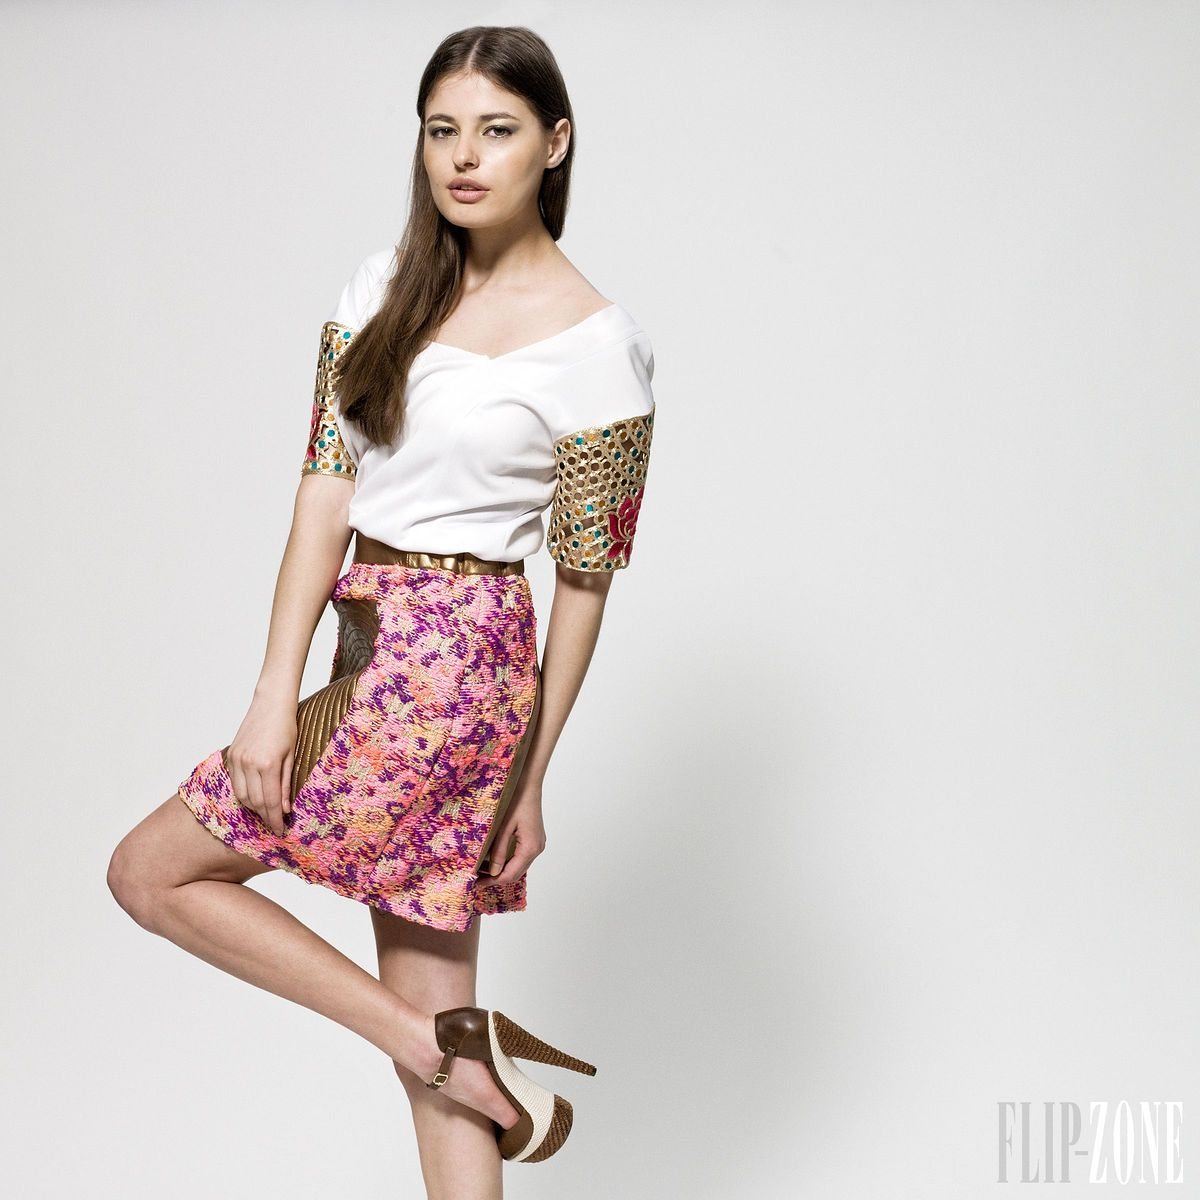 Sara Melki - Ready-to-Wear - Spring-summer 2013 - http://www.flip-zone.net/fashion/ready-to-wear/independant-designers/sara-melki-4082